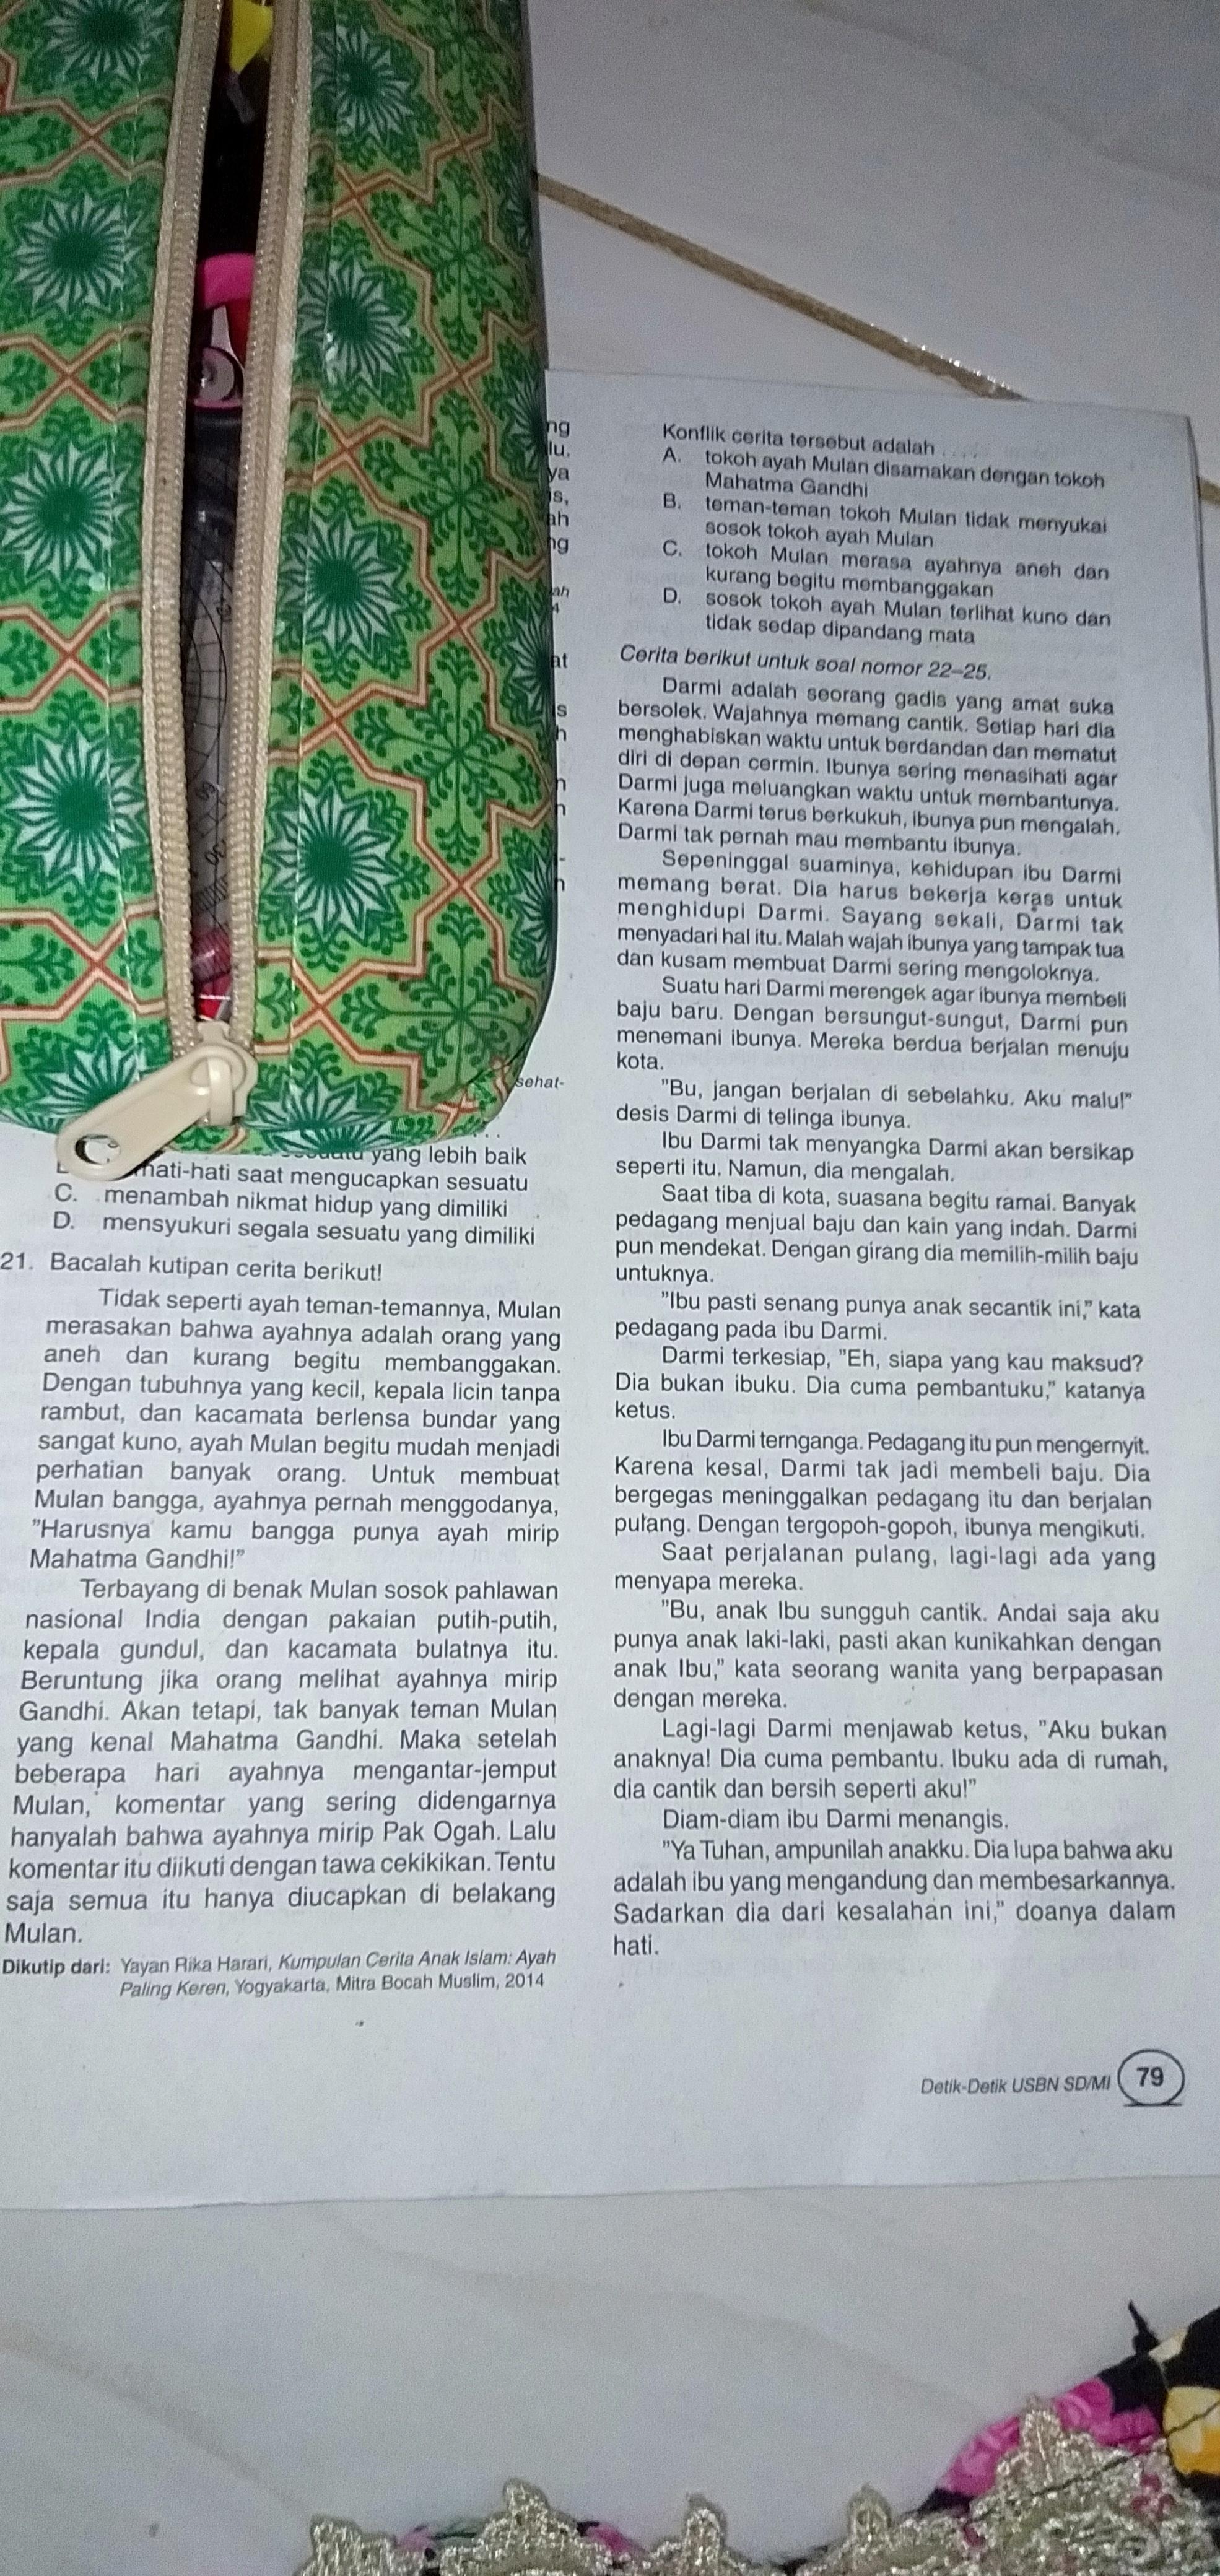 1 Tema Cerita Tersebut Adalah A Penyesalan Seorg Ibu B Durhaka Terhadap Ortu C Keksalan Brainly Co Id